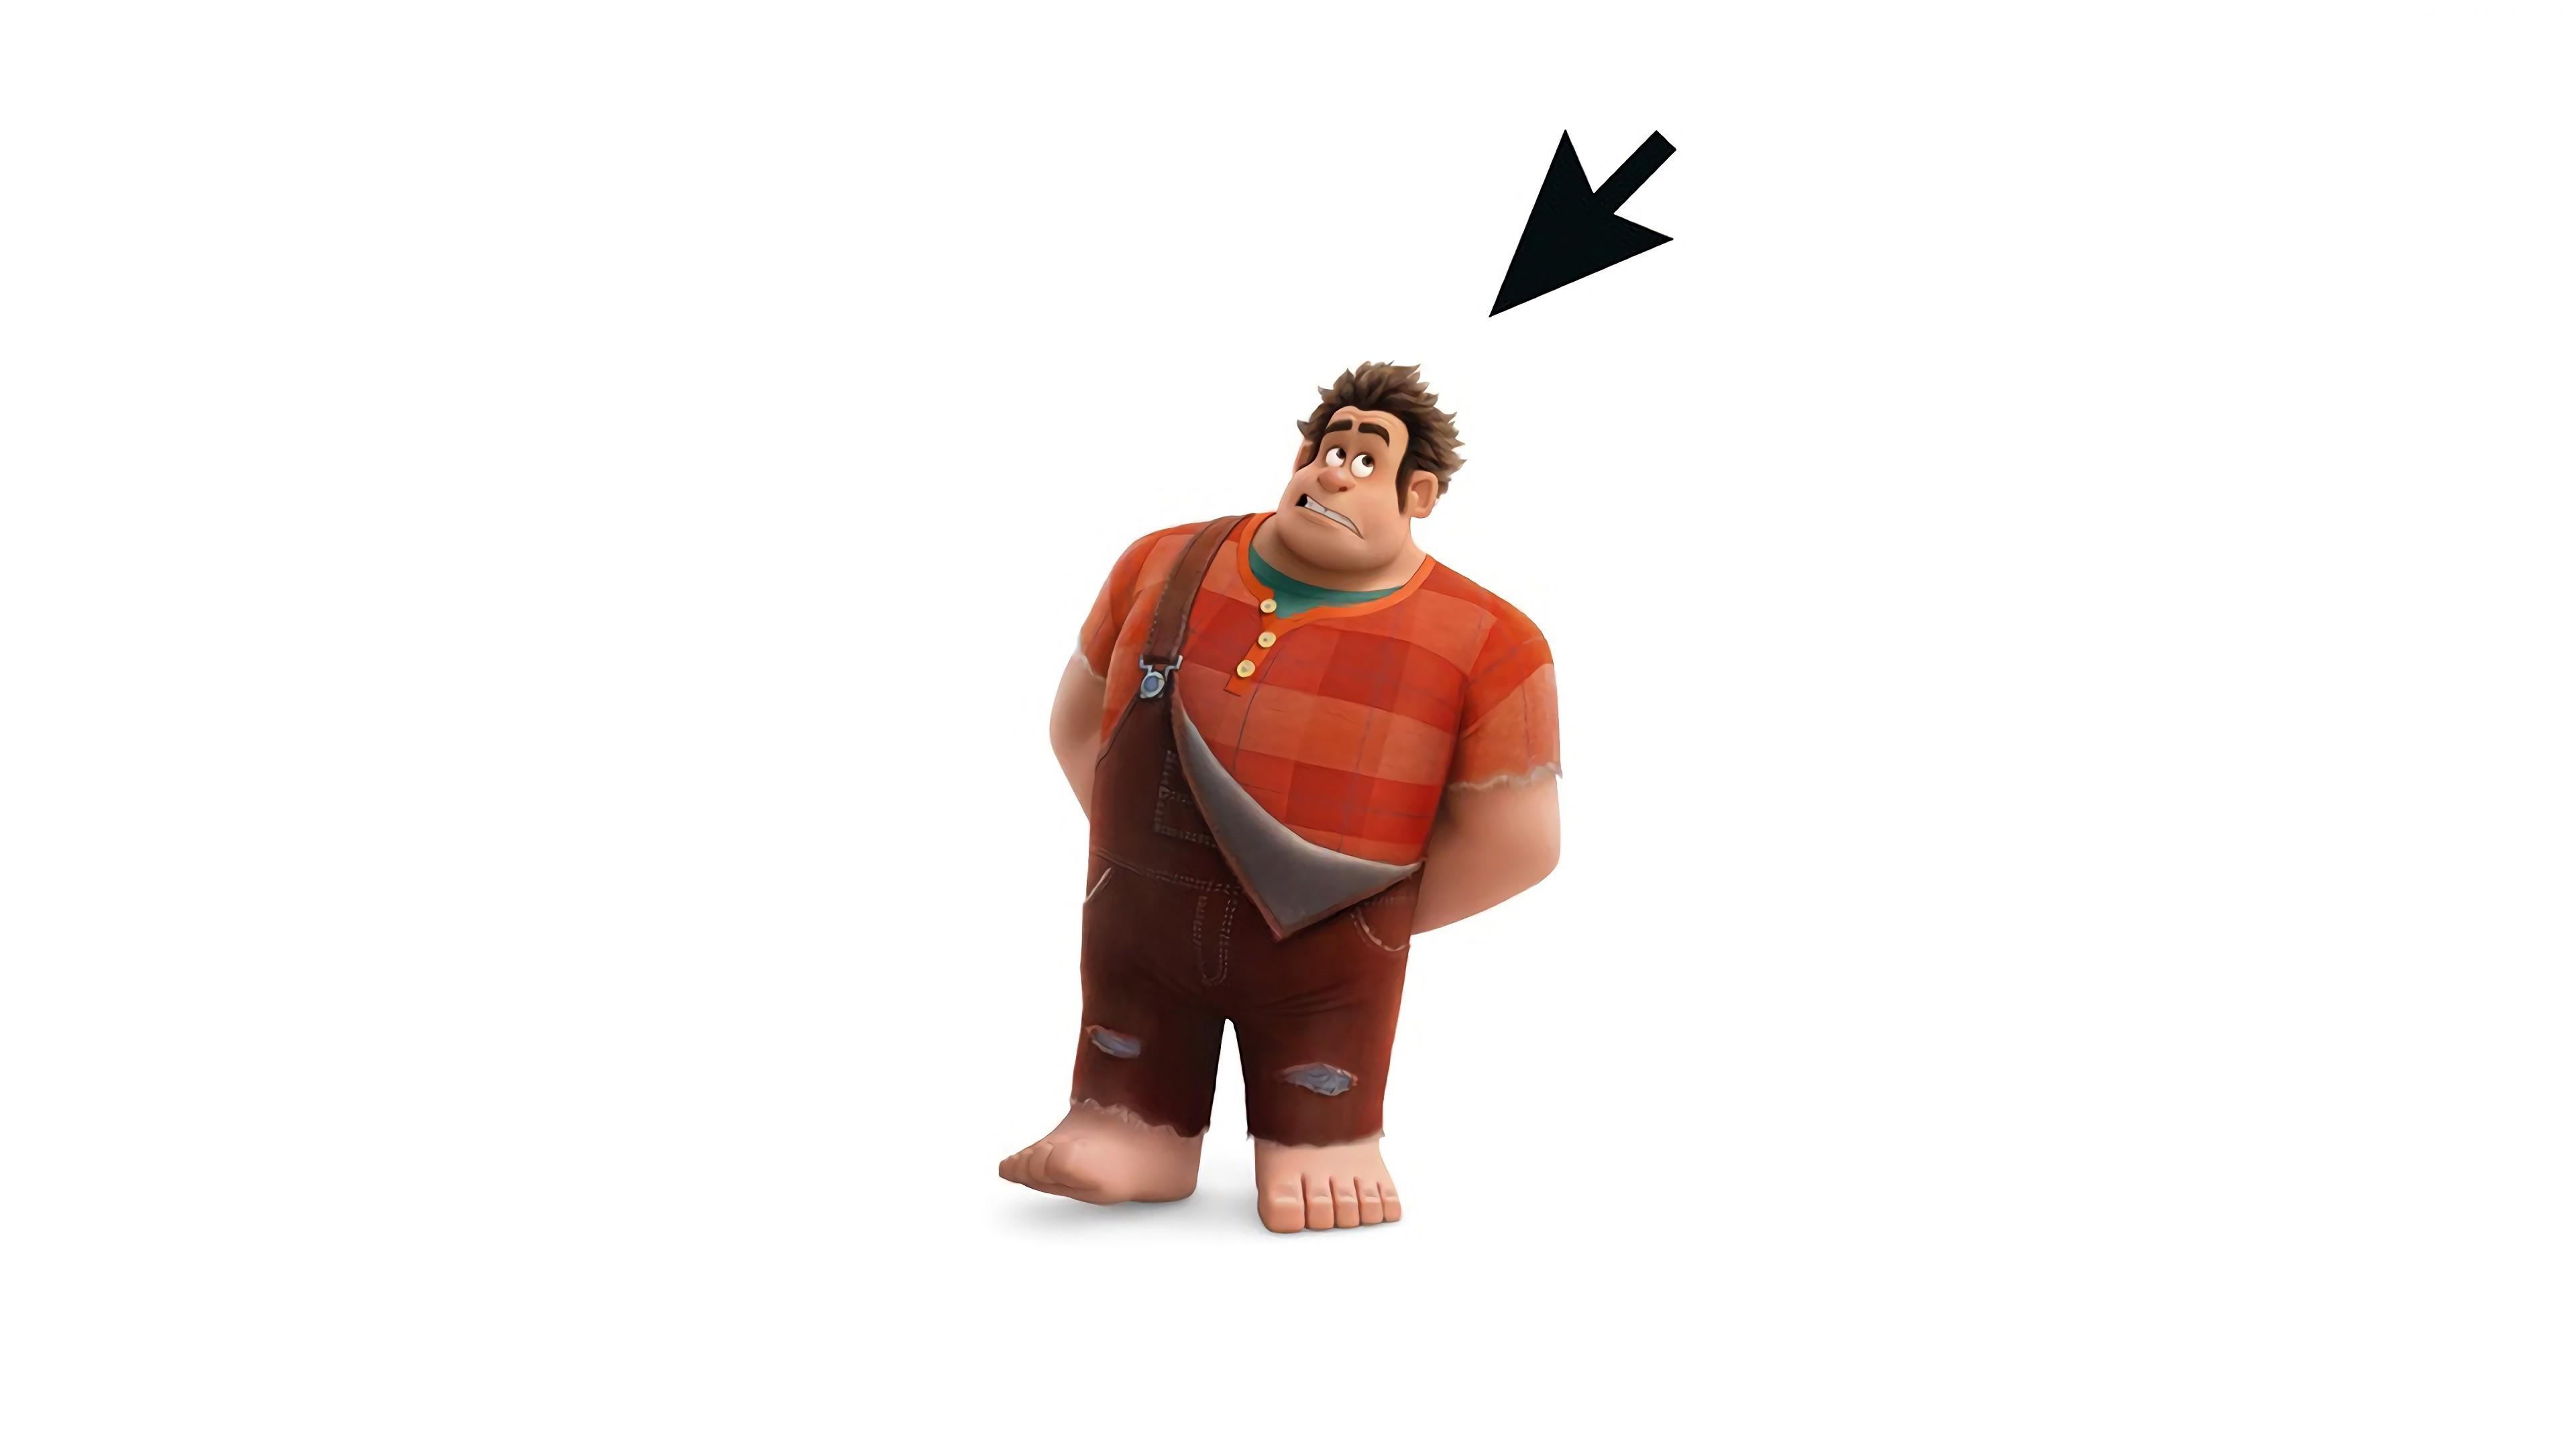 Best Lines From Wreck It Ralph 2: Ralph Breaks The Internet Wreck It Ralph 2 Movie 2018, HD